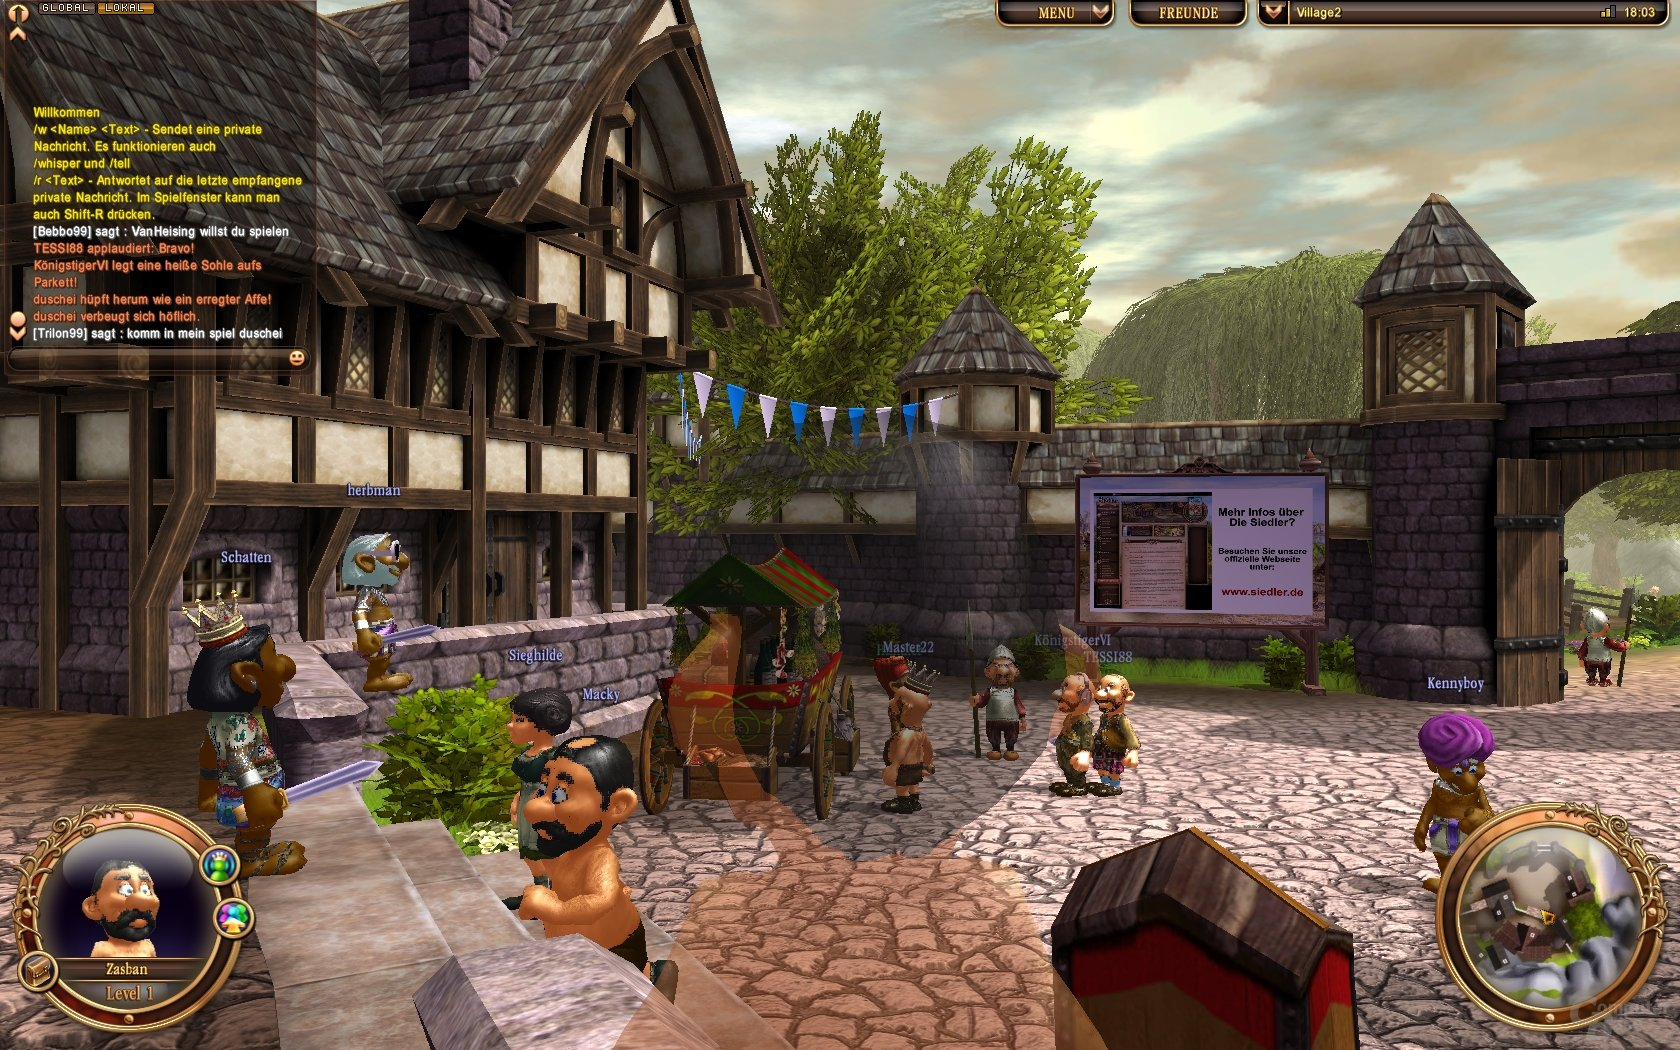 AdK - Multiplayer-Lobby